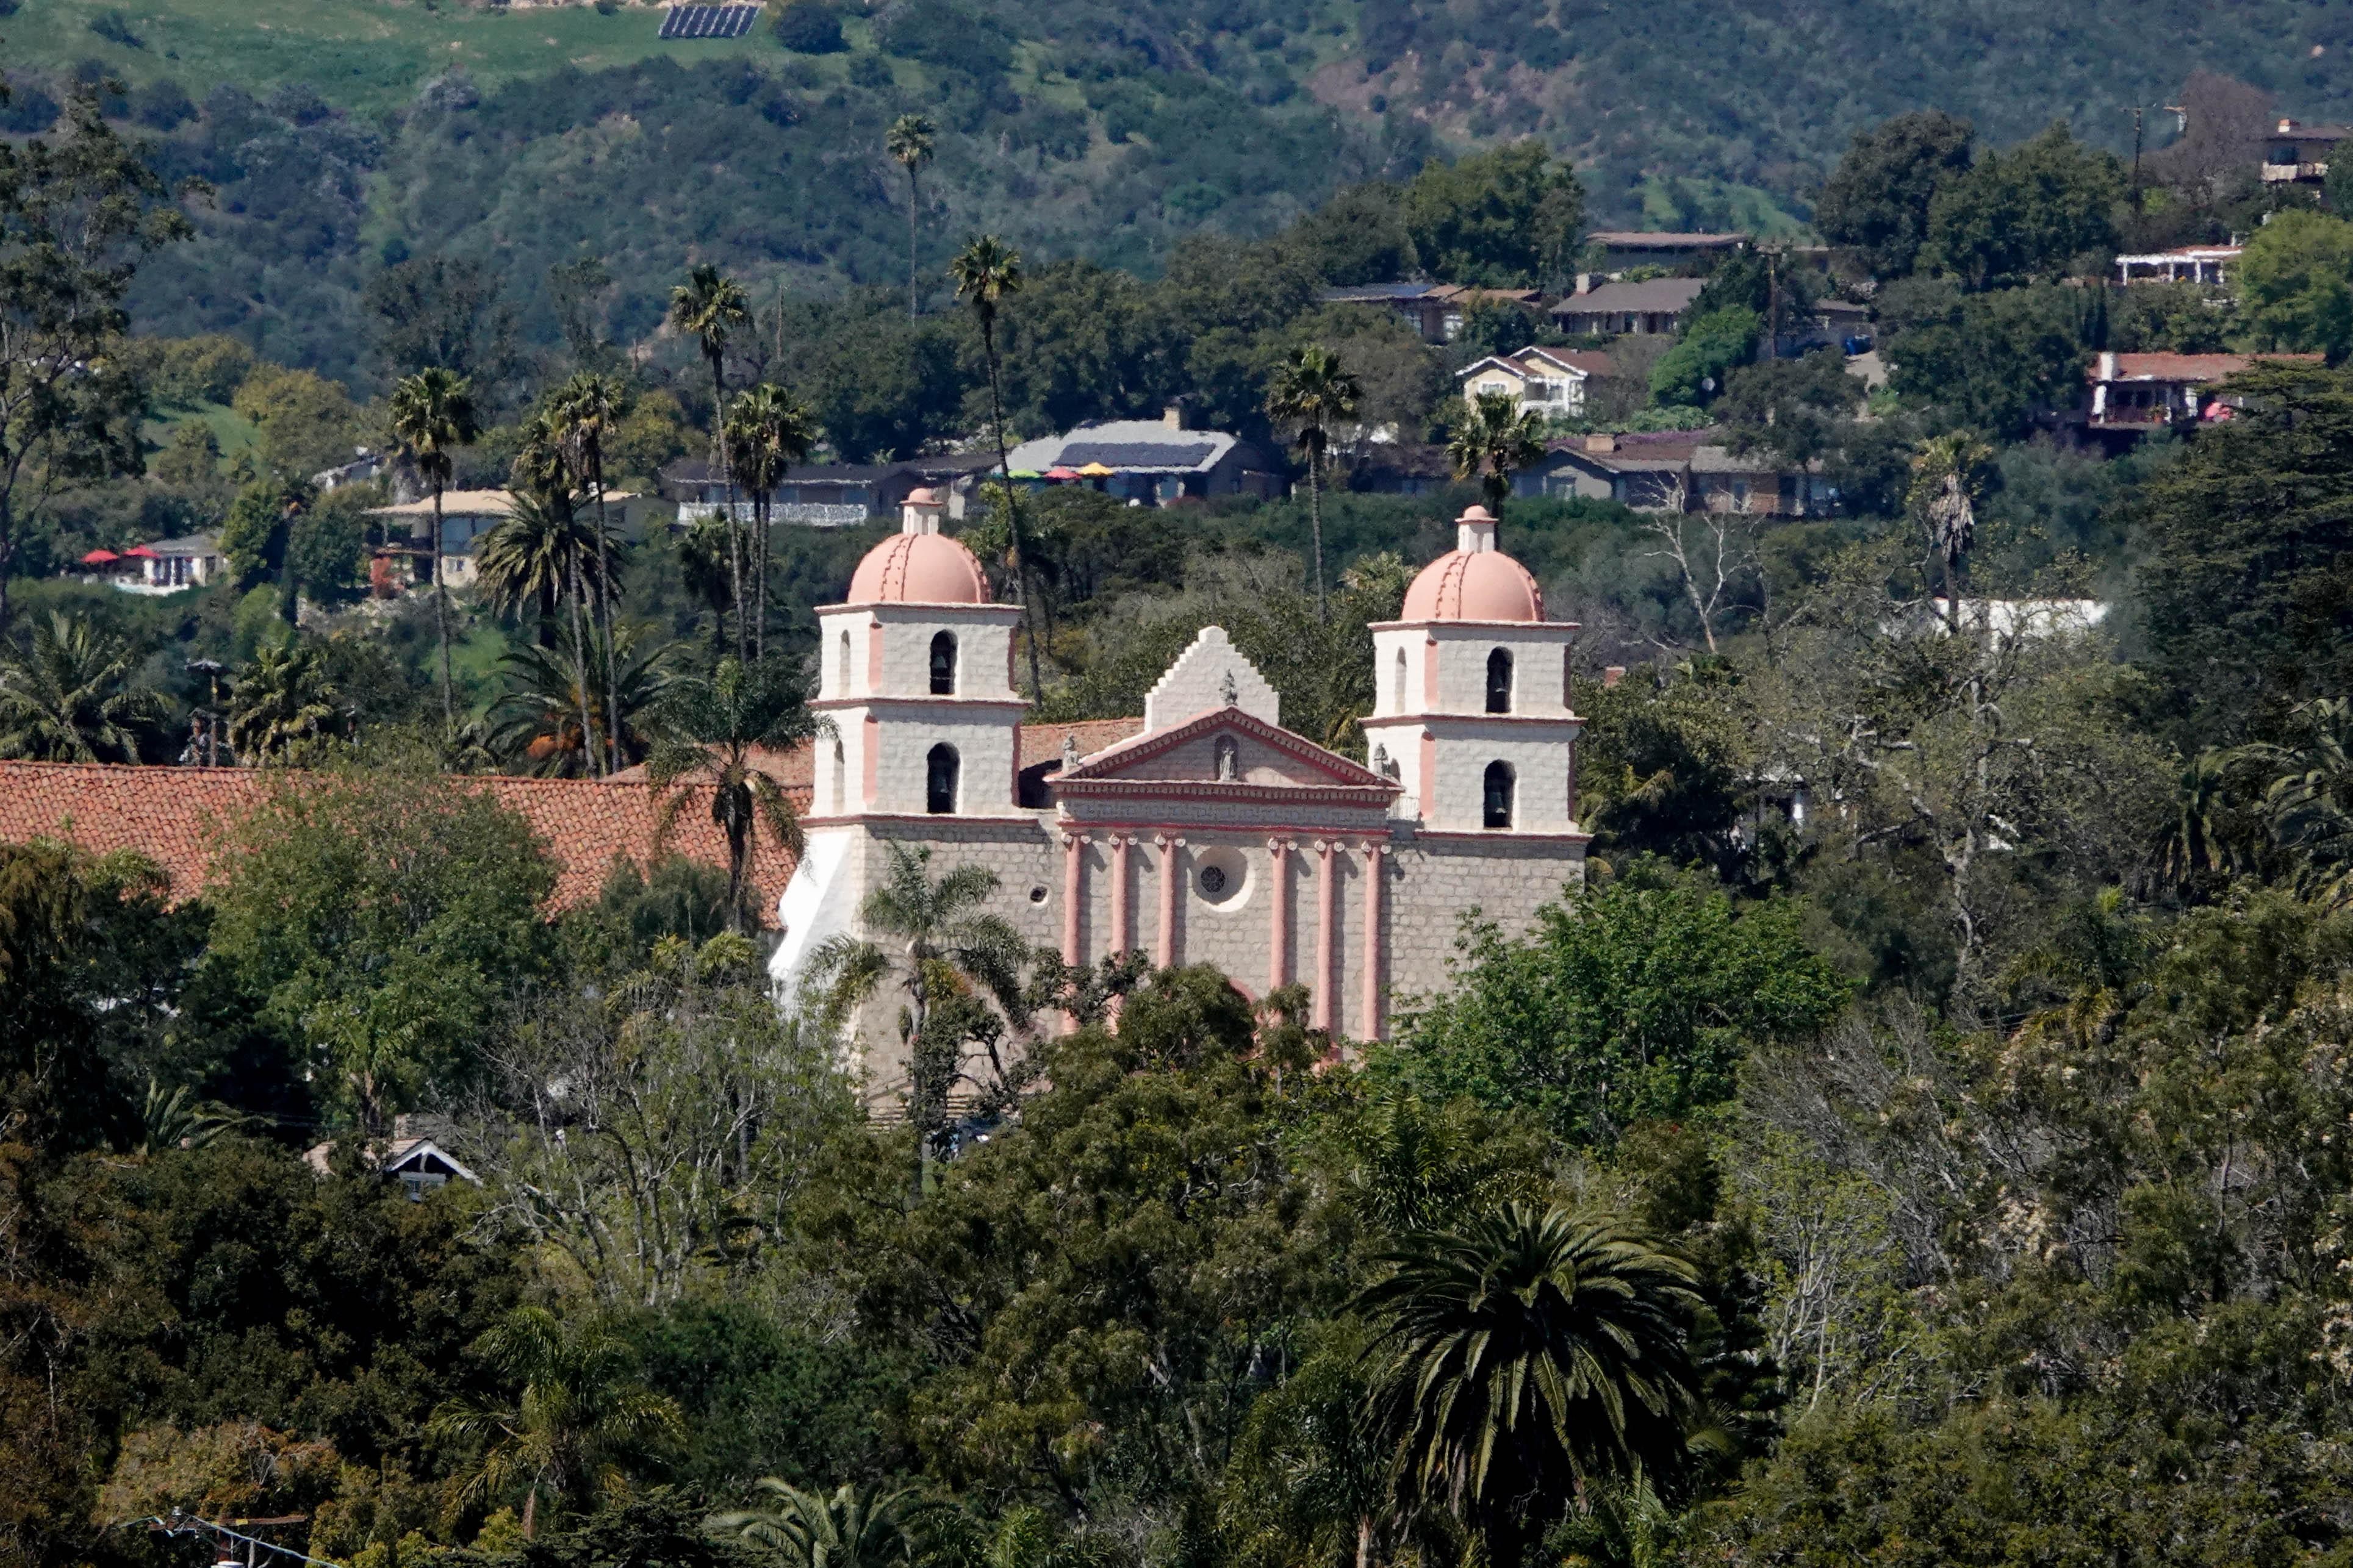 Photo tour of beautiful Santa Barbara: Spanish architecture, beach and entertainment abound